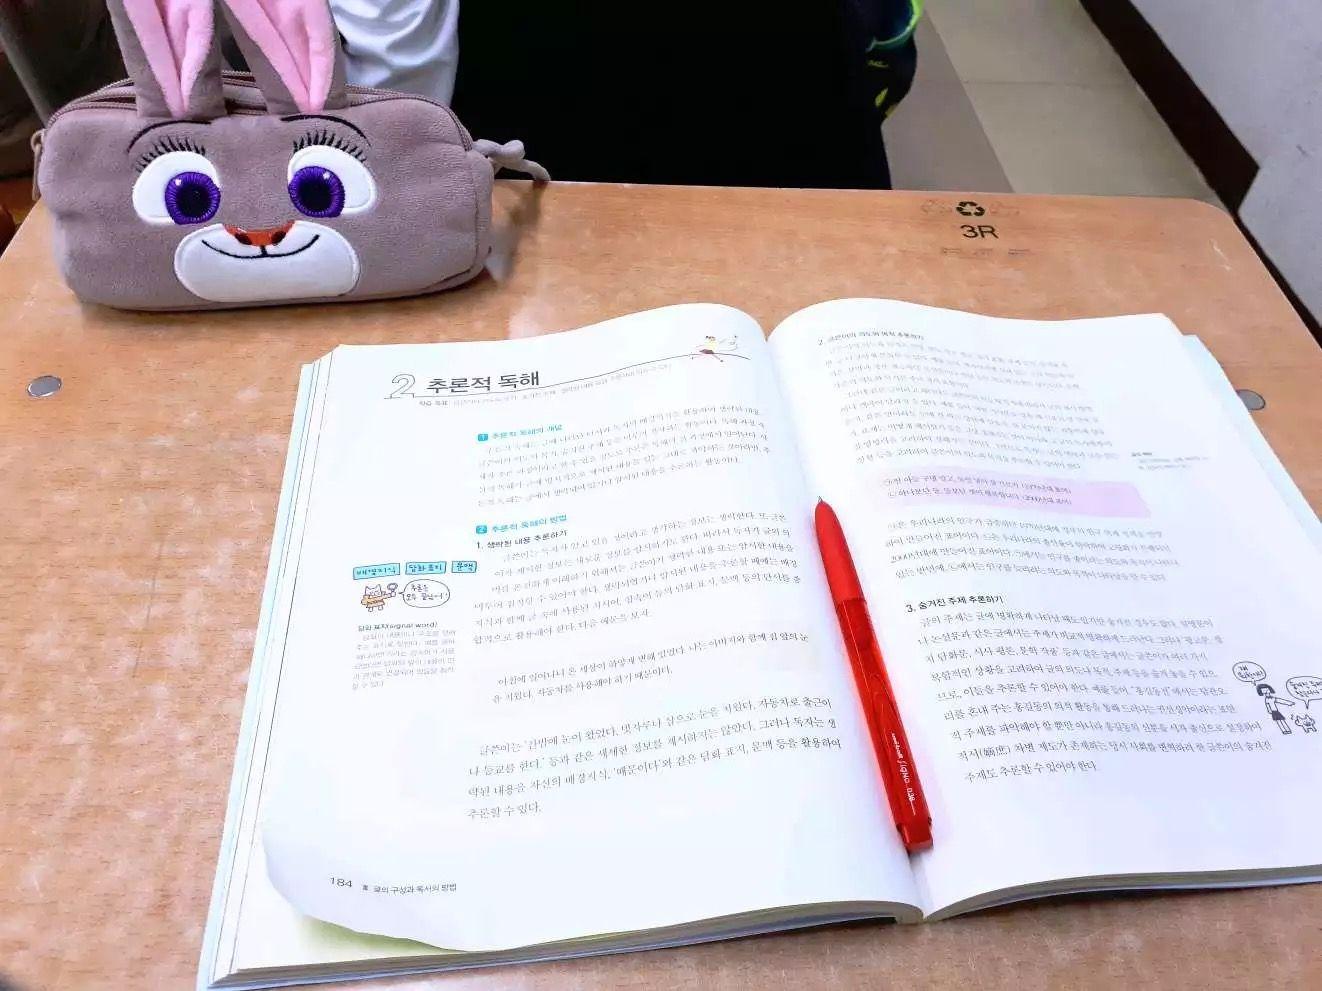 Pin by Nia on STUDY INSPIRATION Study inspiration, Study